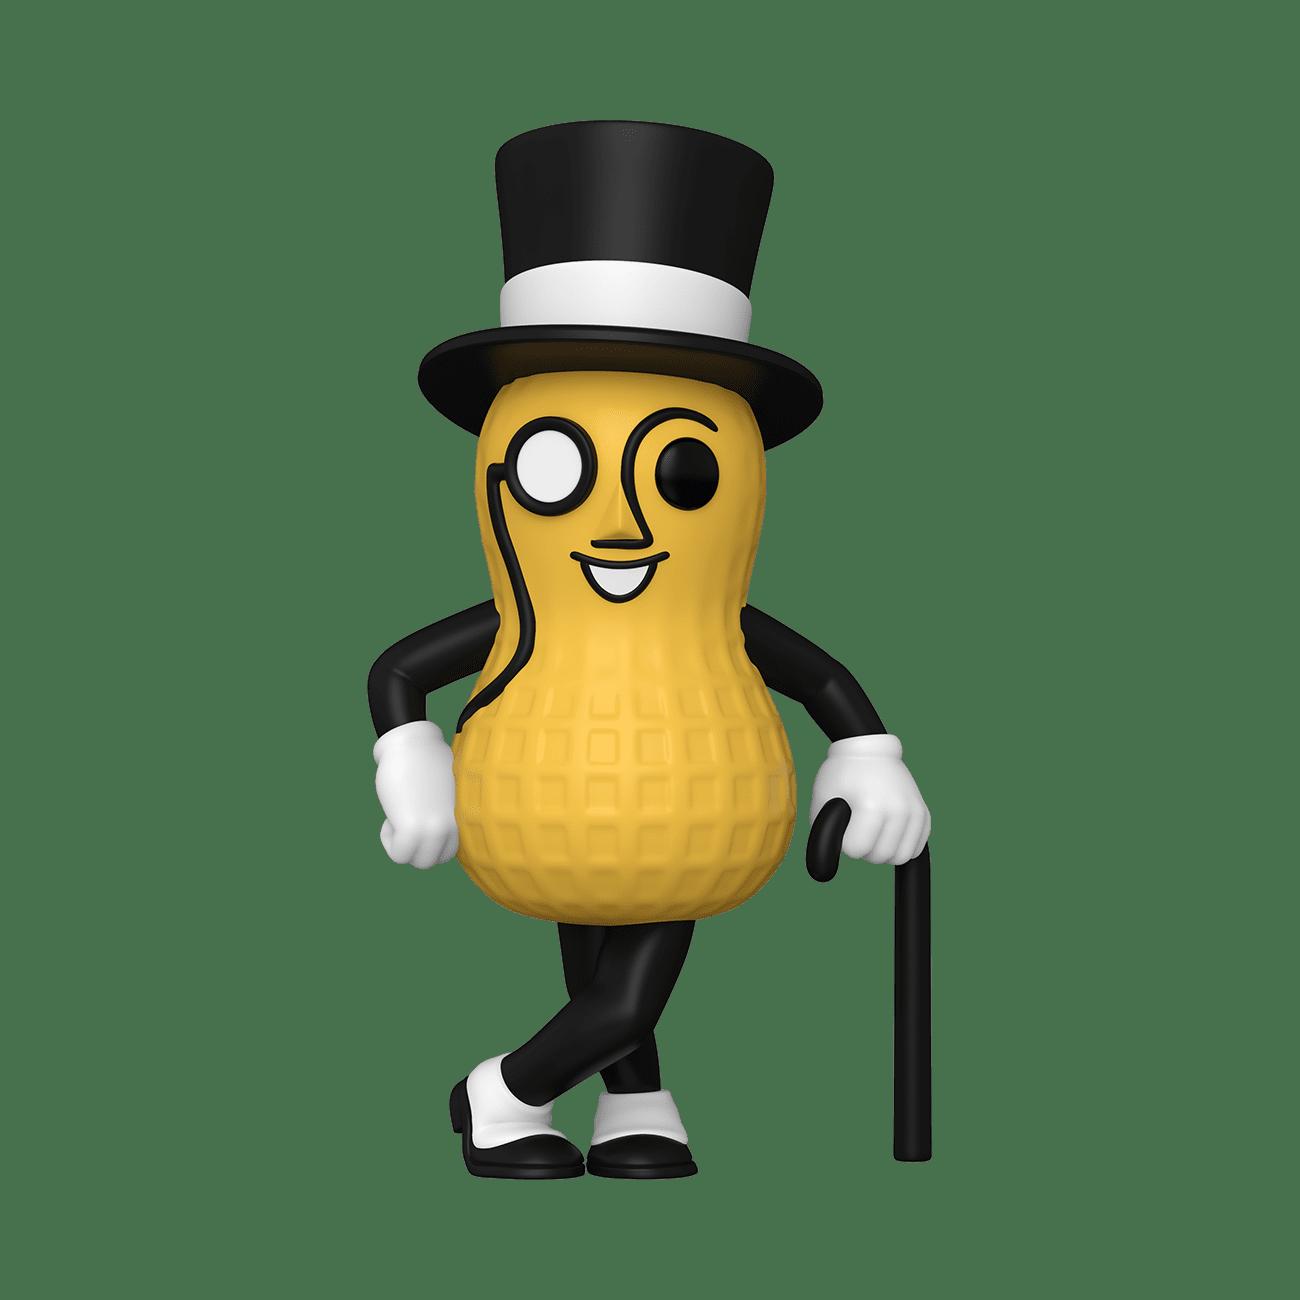 ad icons mr peanut funko